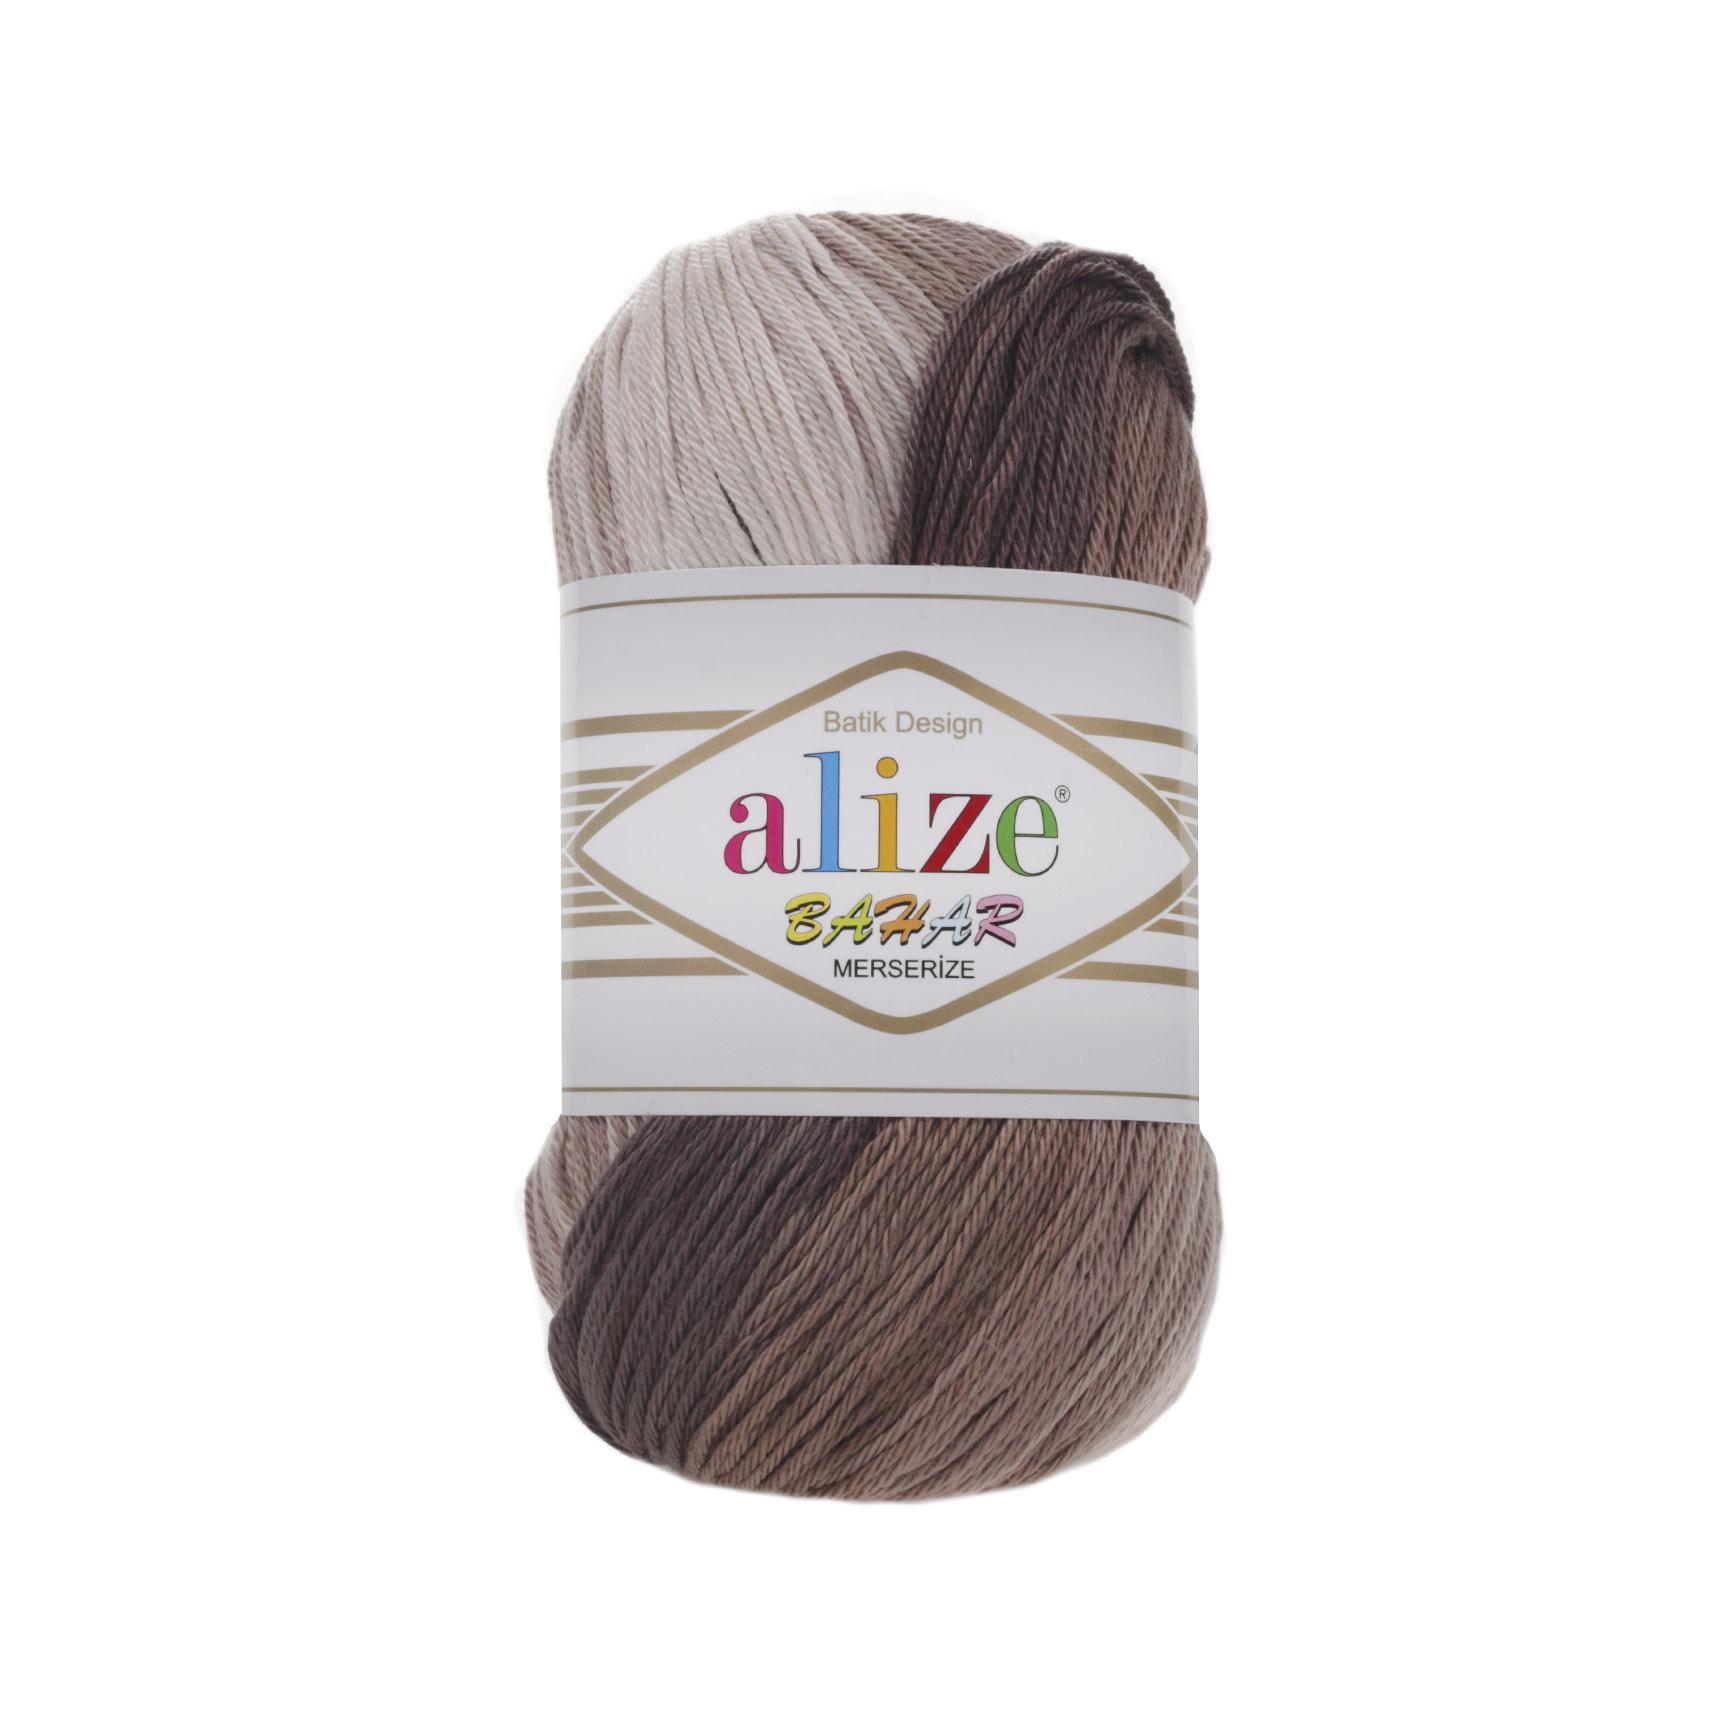 Alize Bahar Batik Design cod 1815-0